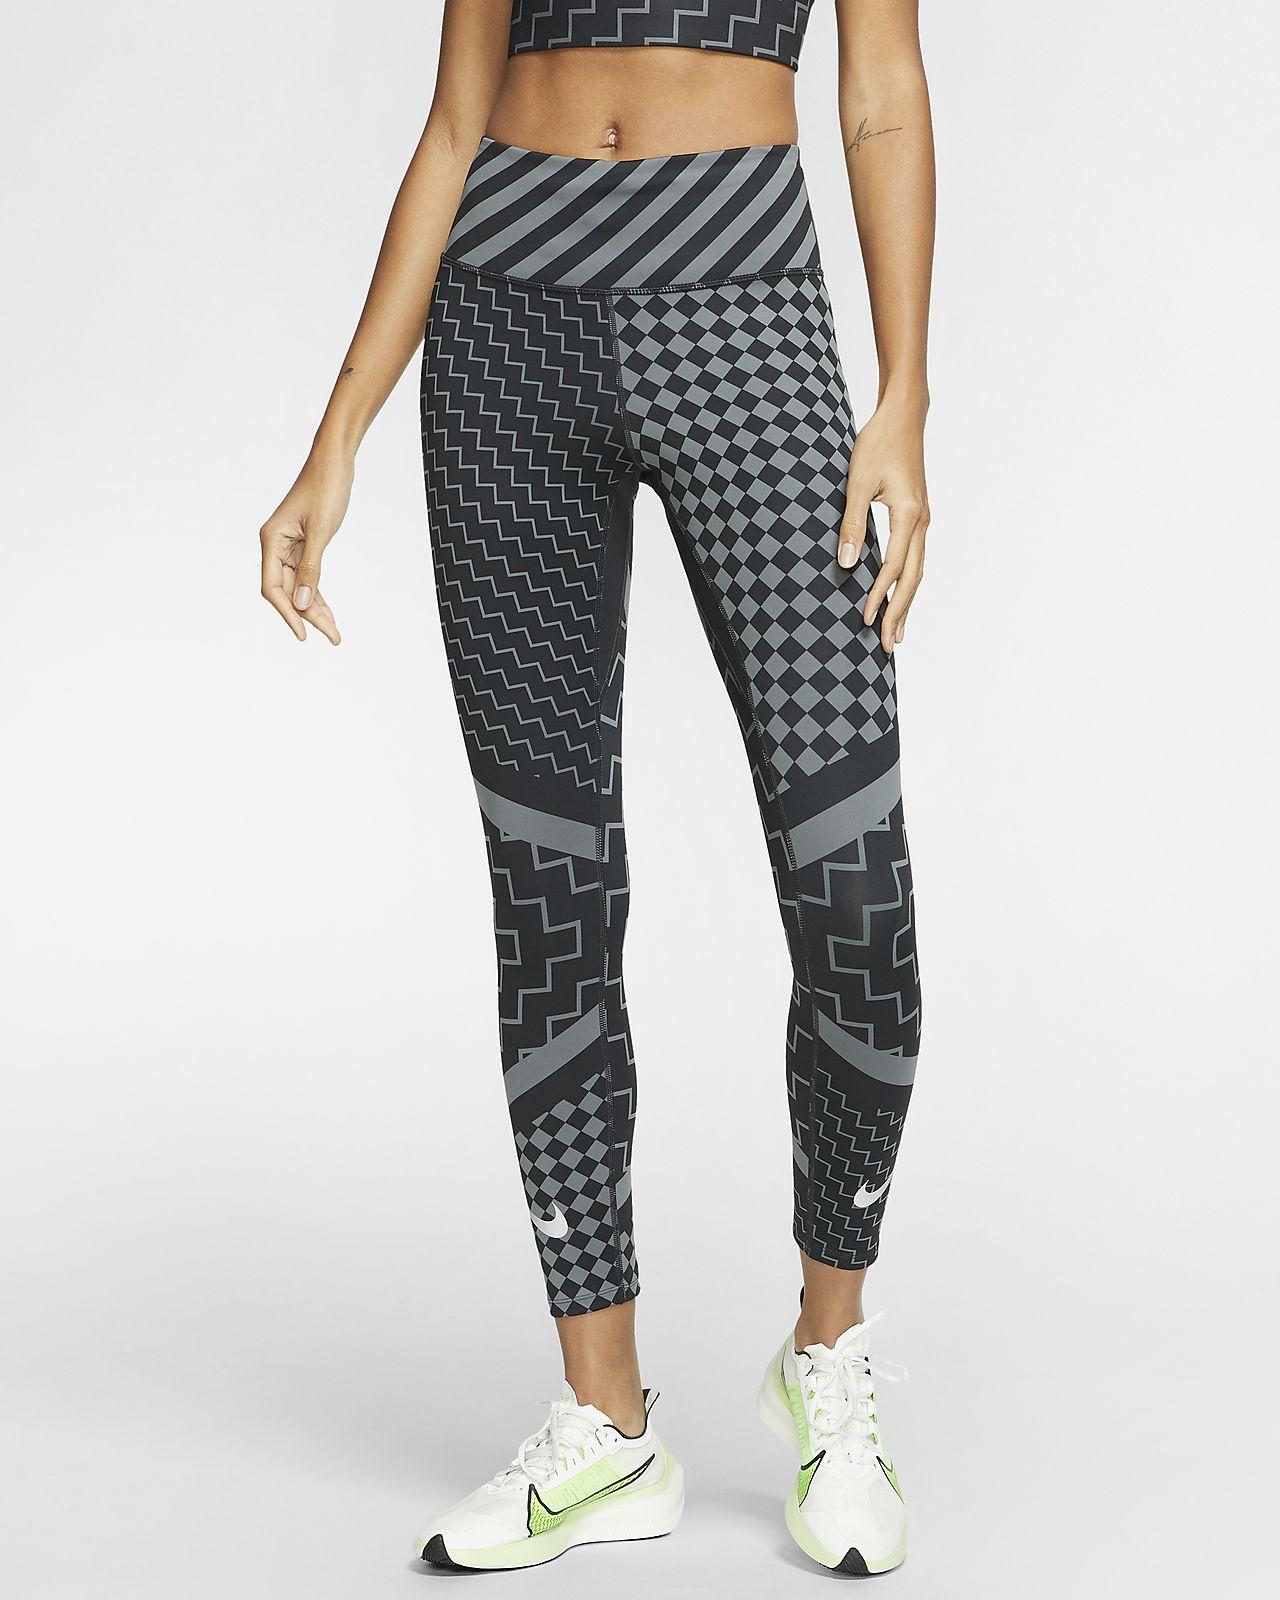 Nike Epic Lux Malles de running - Dona